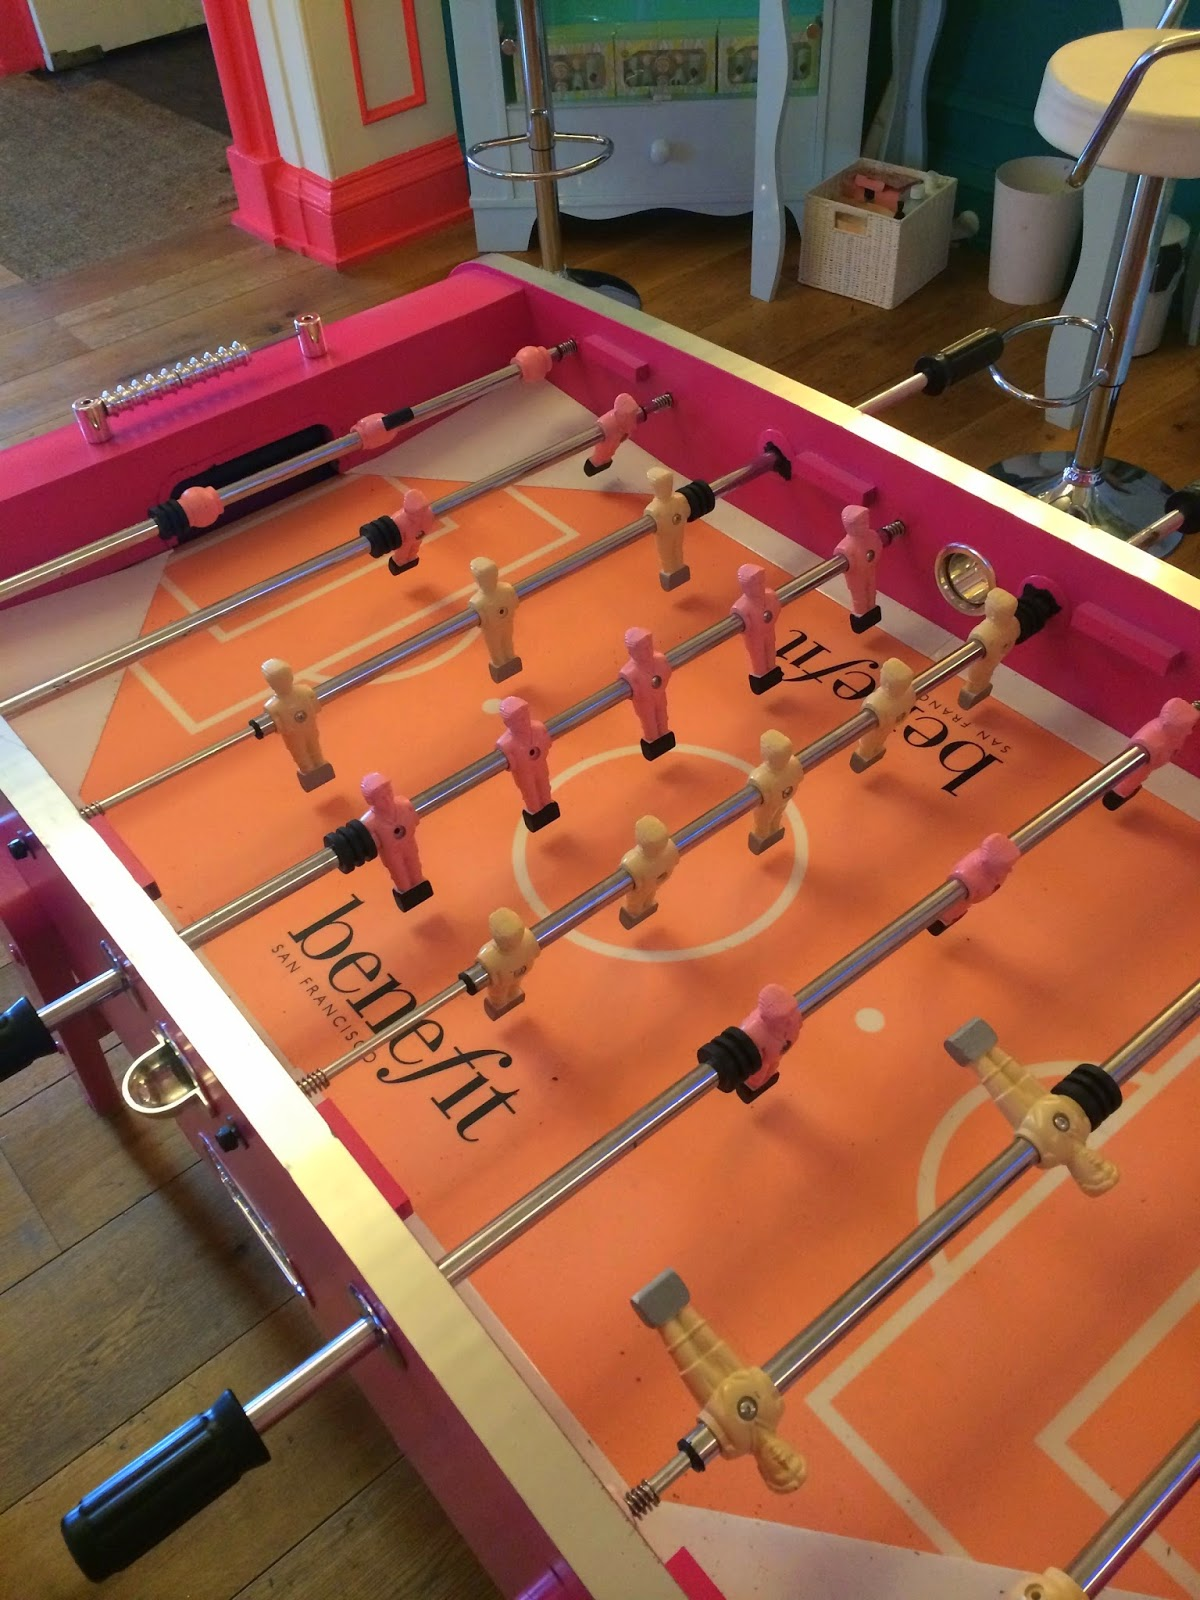 gabbis-head-foosball-darts-pink